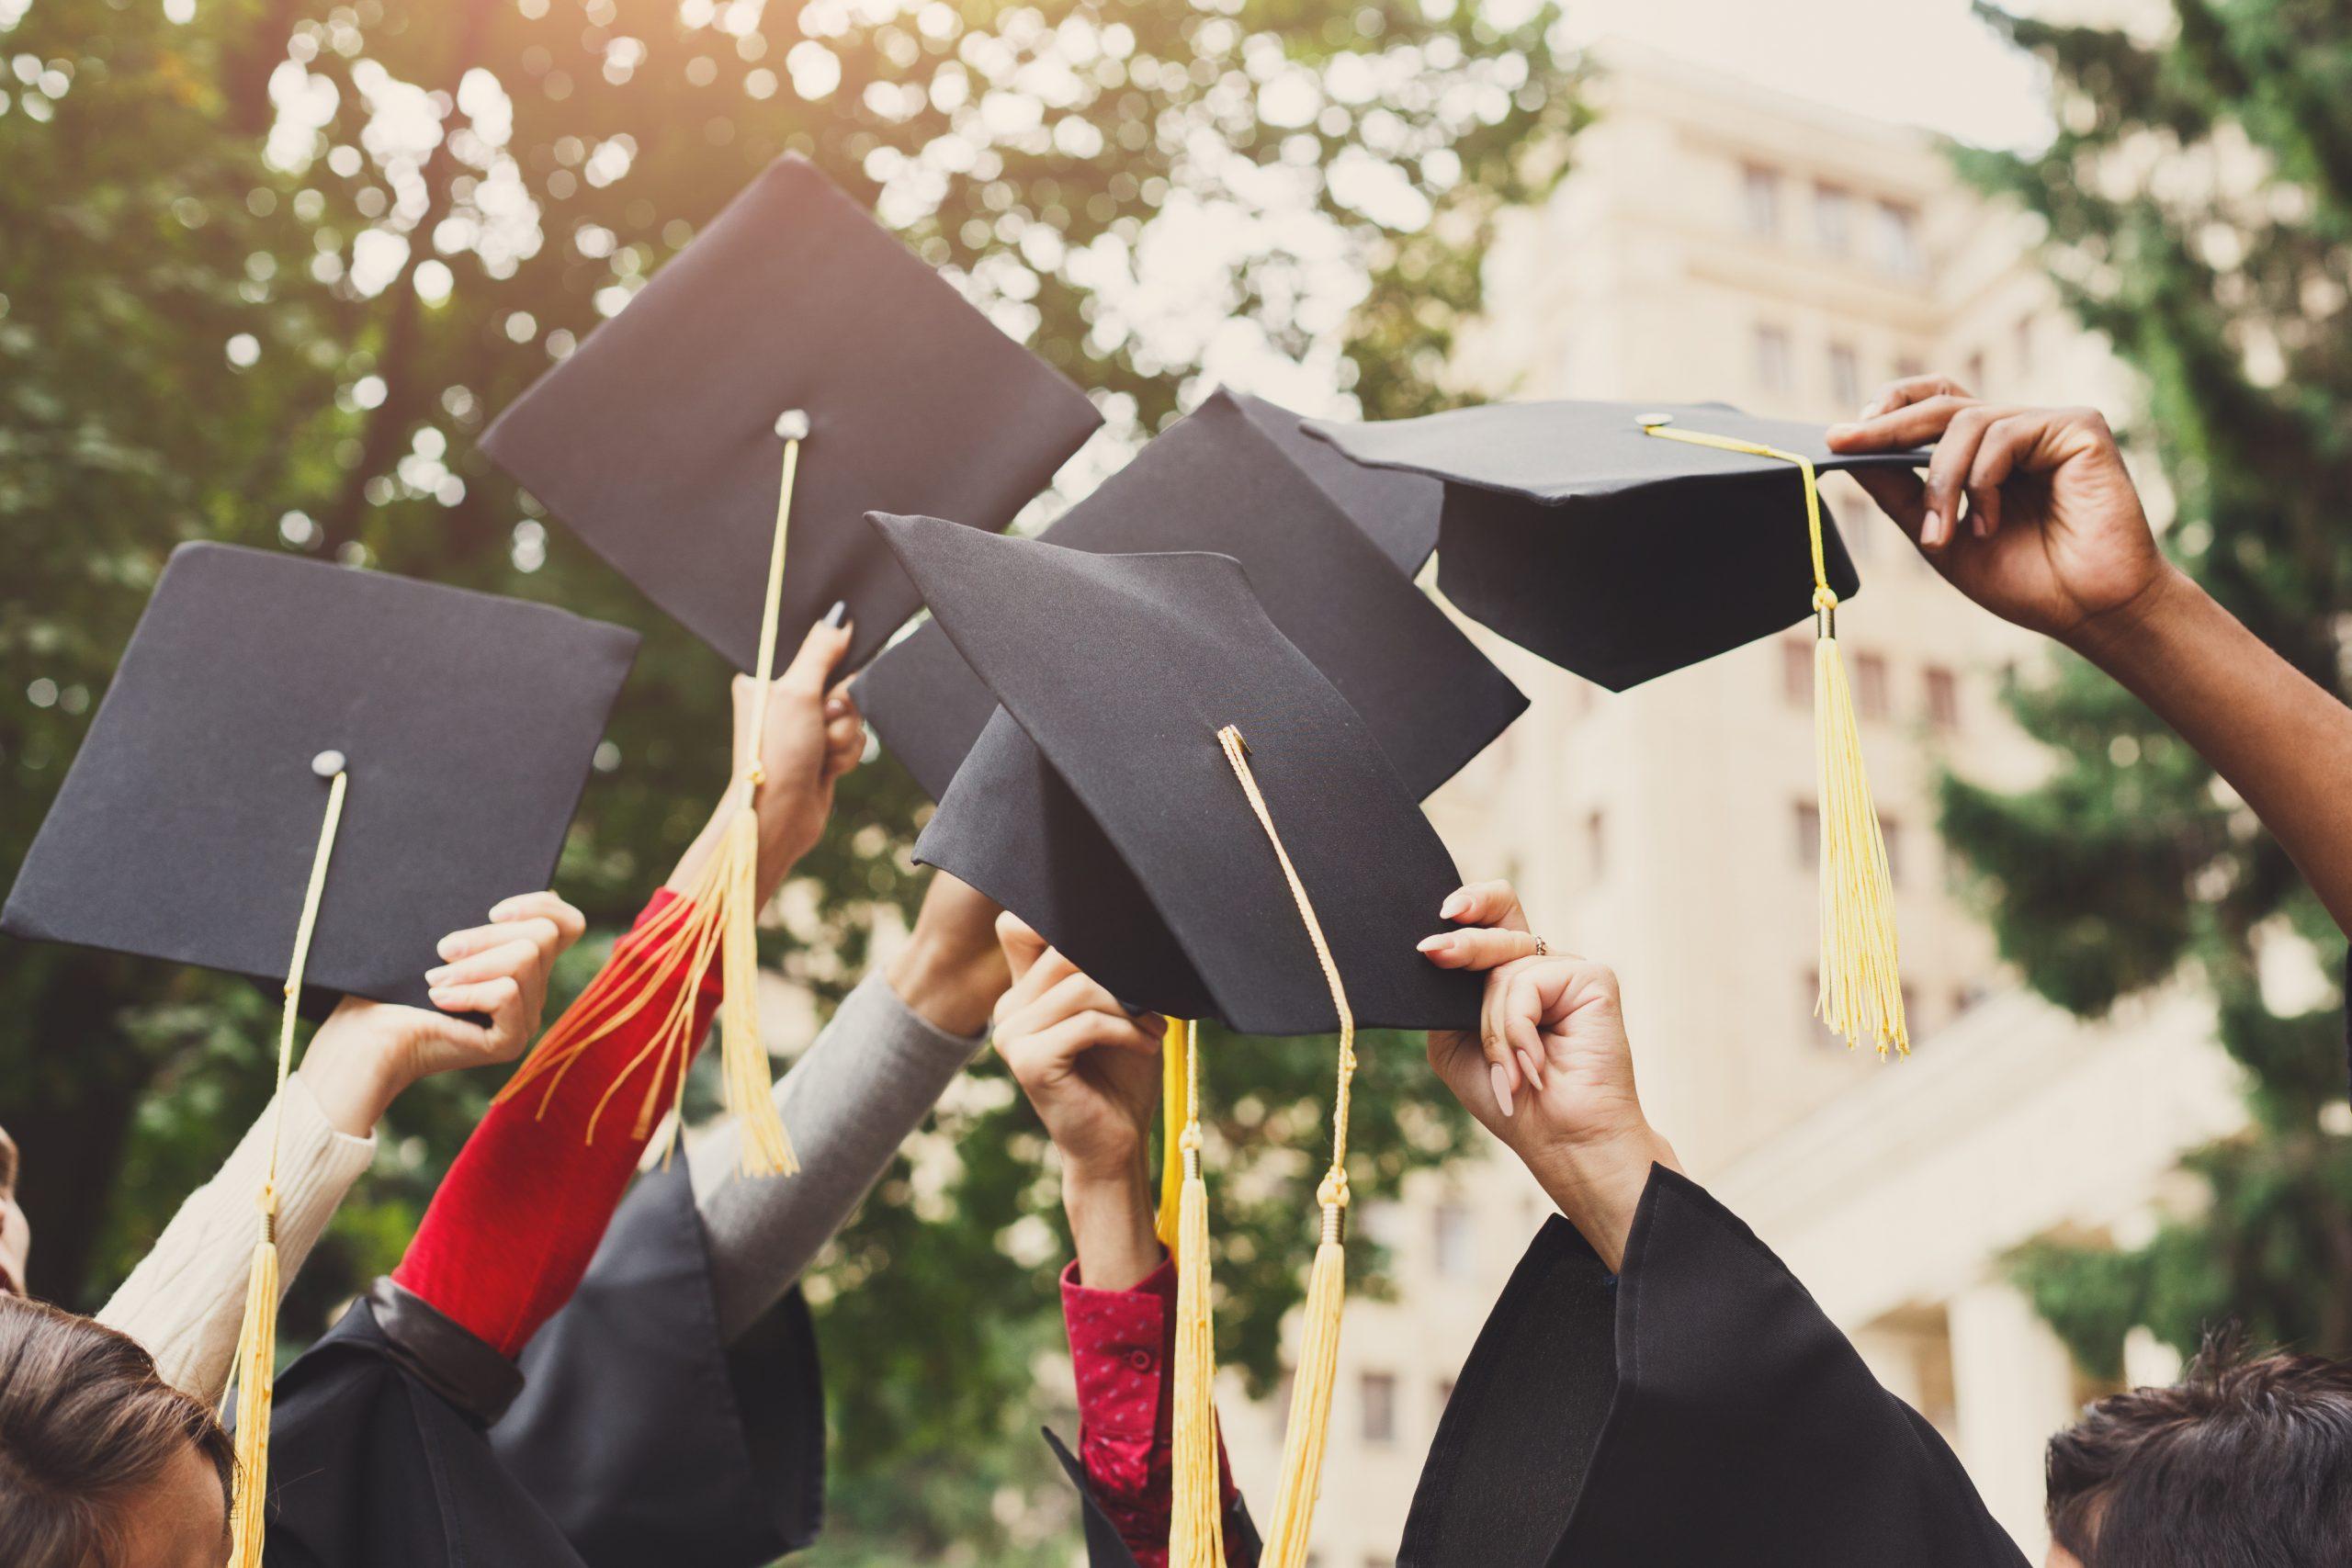 How To วิธีปรับตัวเข้ามหาวิทยาลัย